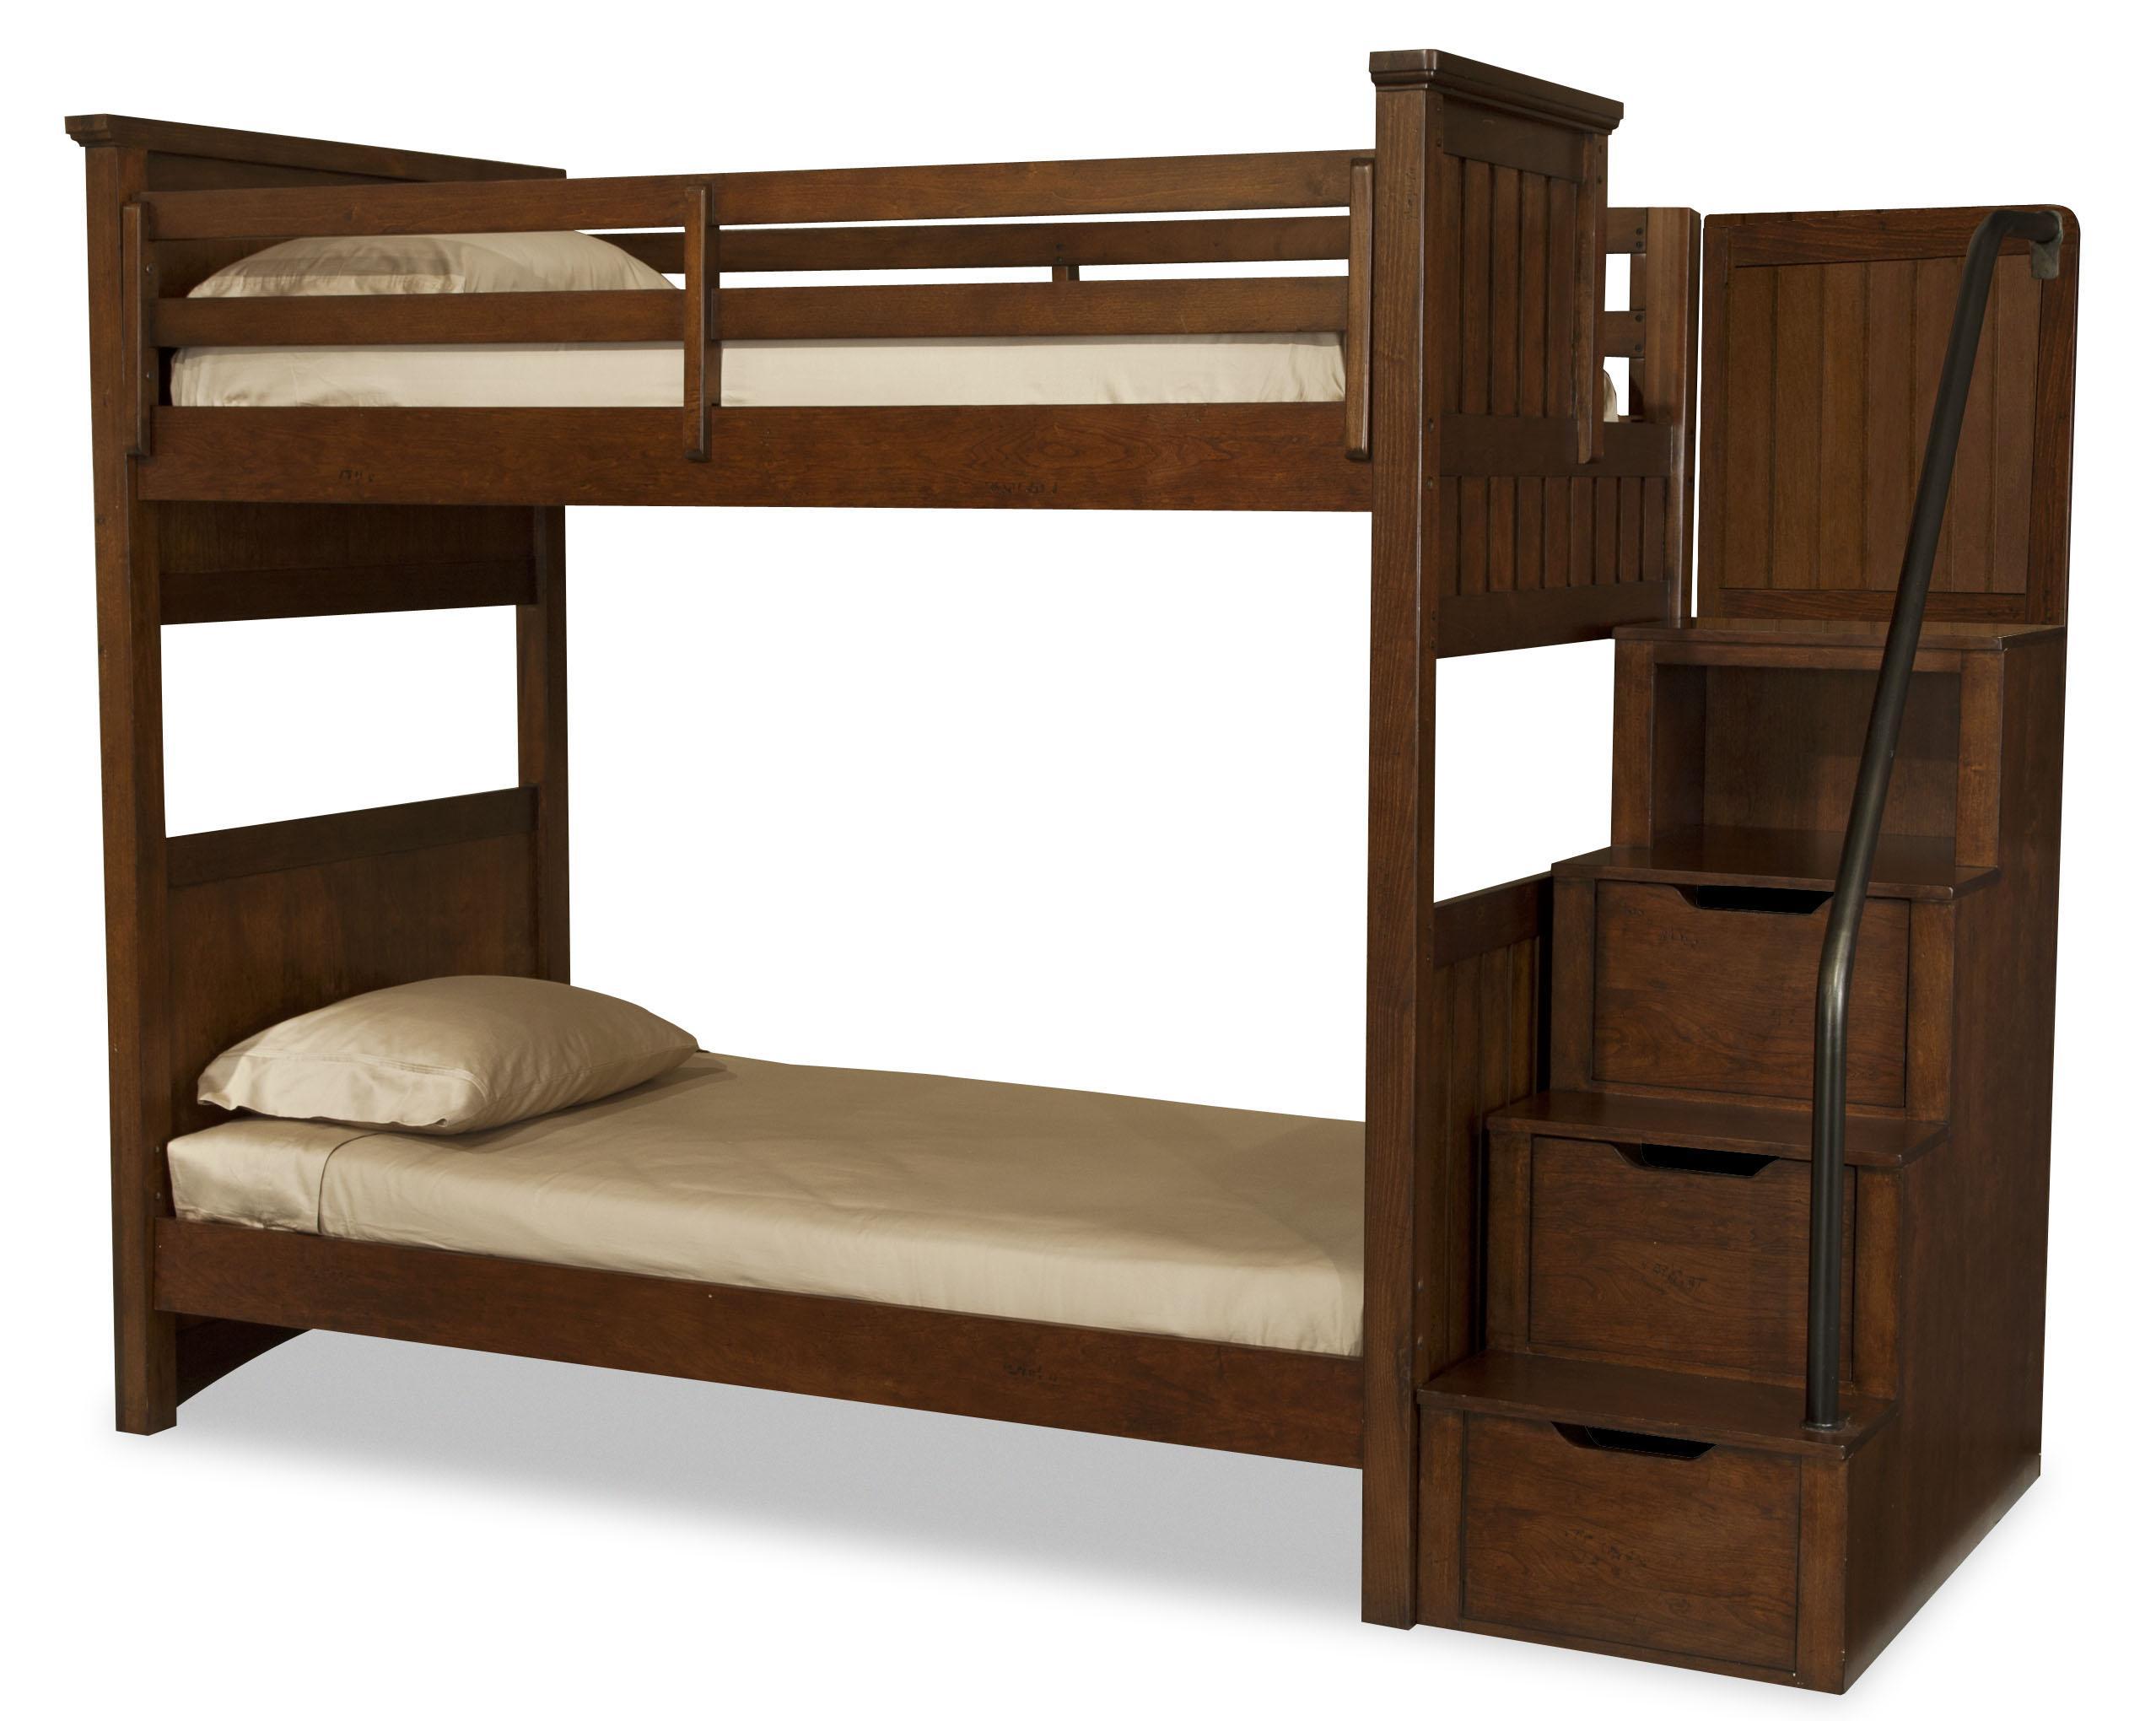 Legacy Classic Kids Dawson's Ridge Twin-over-Twin Bunk w/ Storage Stair - Item Number: 2960-8510+8310+2x888-4923C+8000